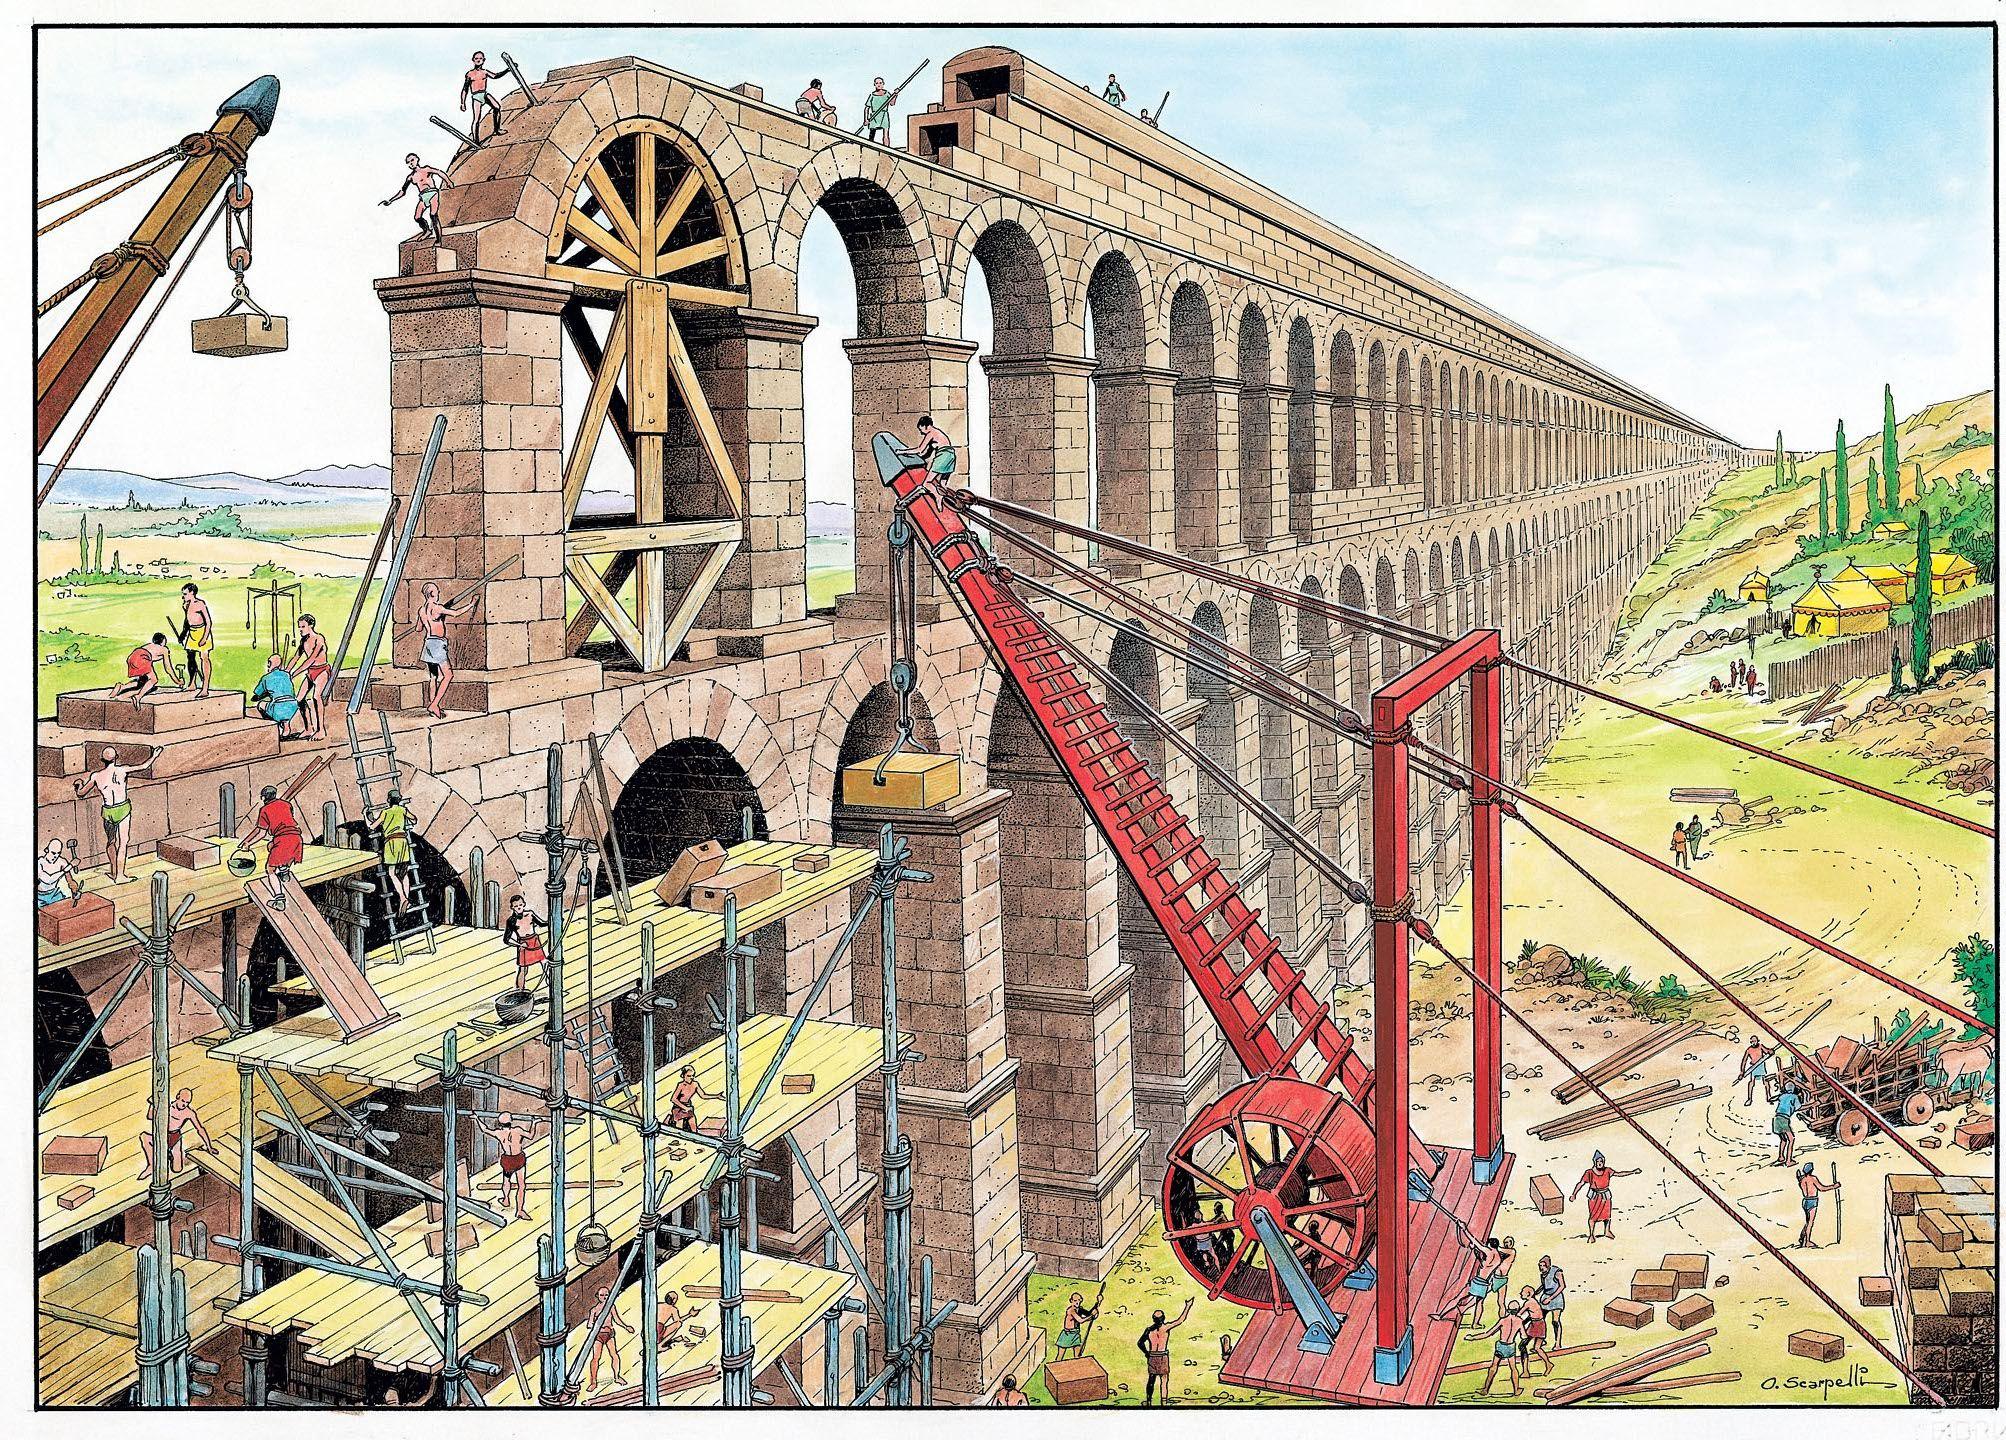 Construction of an aqueduct ~ O. Scarpelli